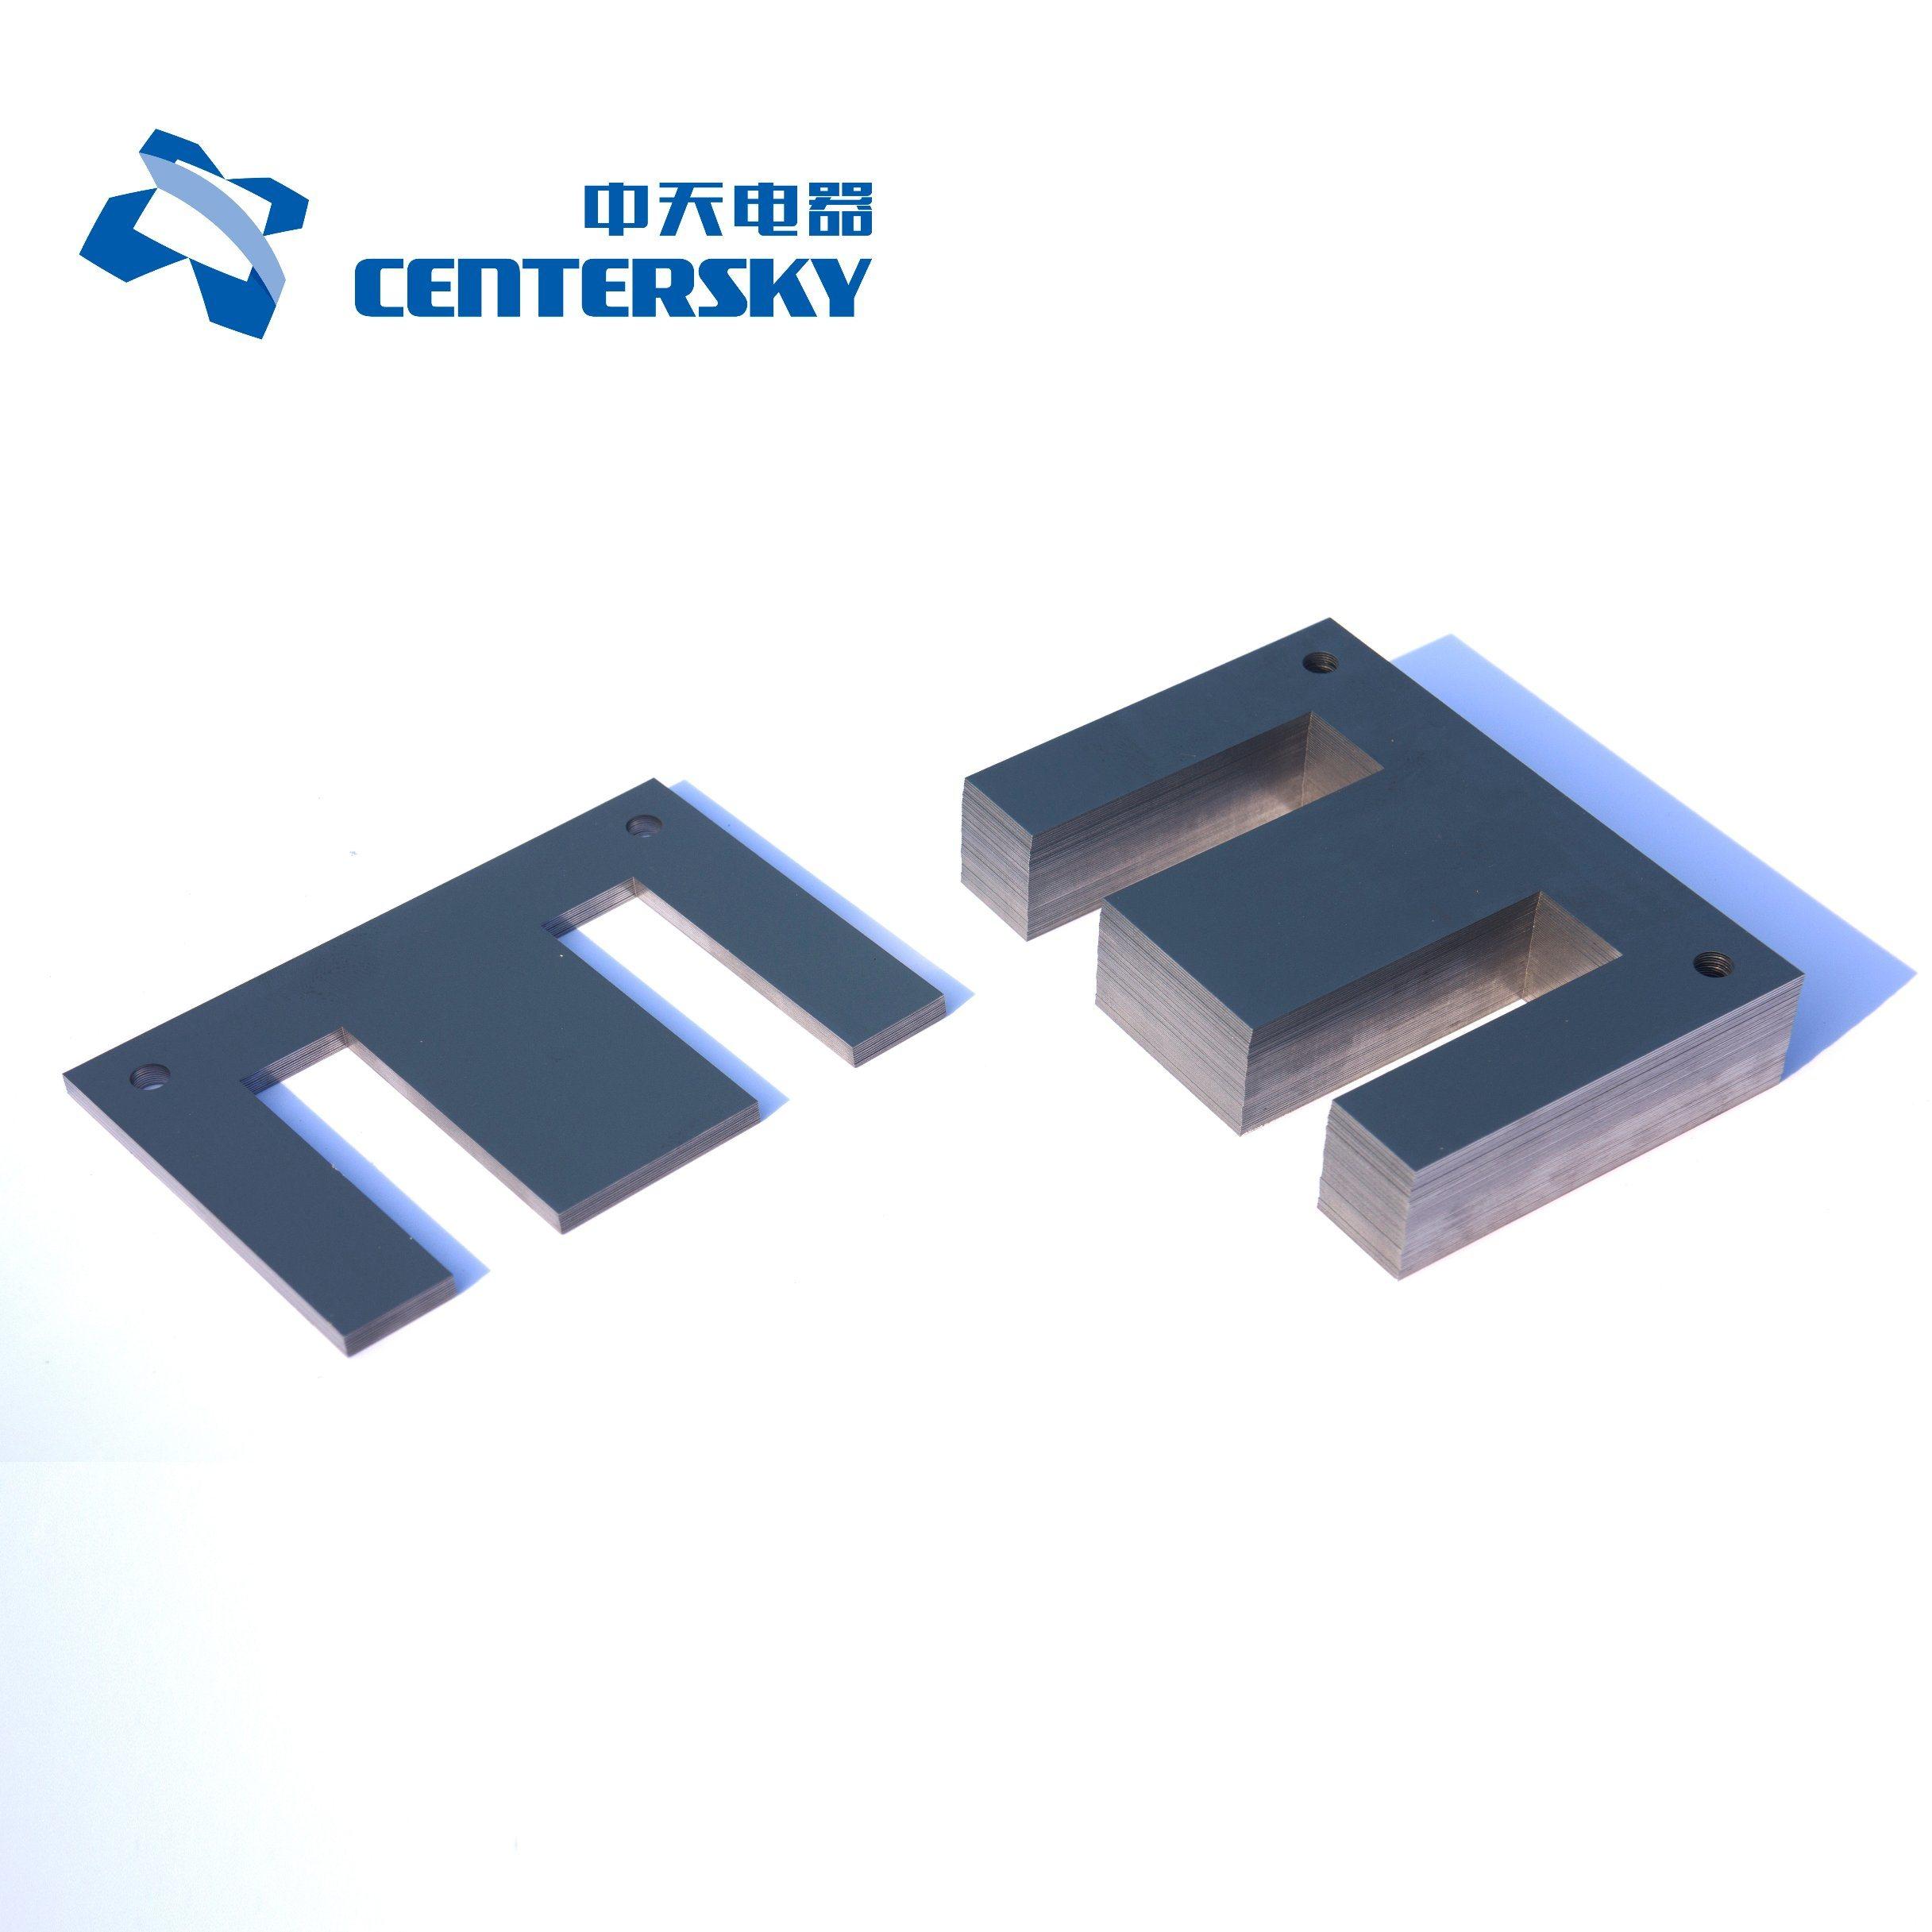 Centersky Ei Silicon Steel CRGO Lamination Sheet